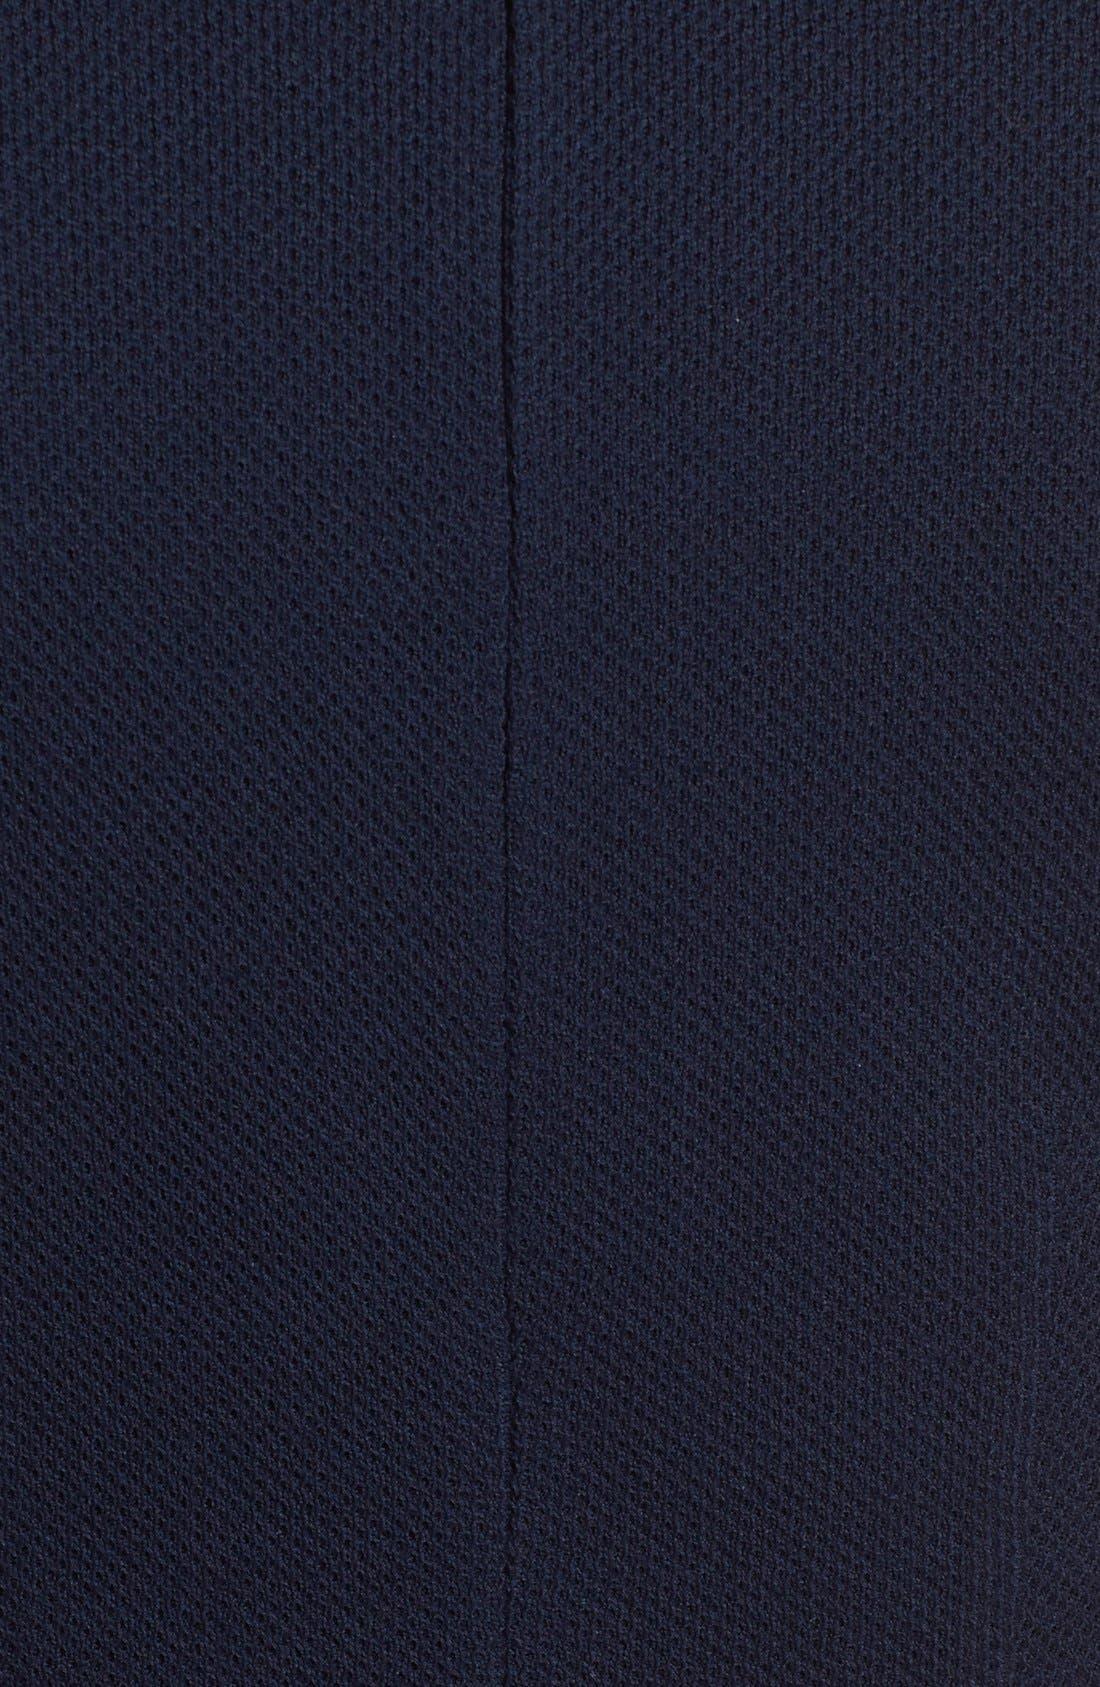 Peplum Milano Piqué Knit Dress,                             Alternate thumbnail 5, color,                             400